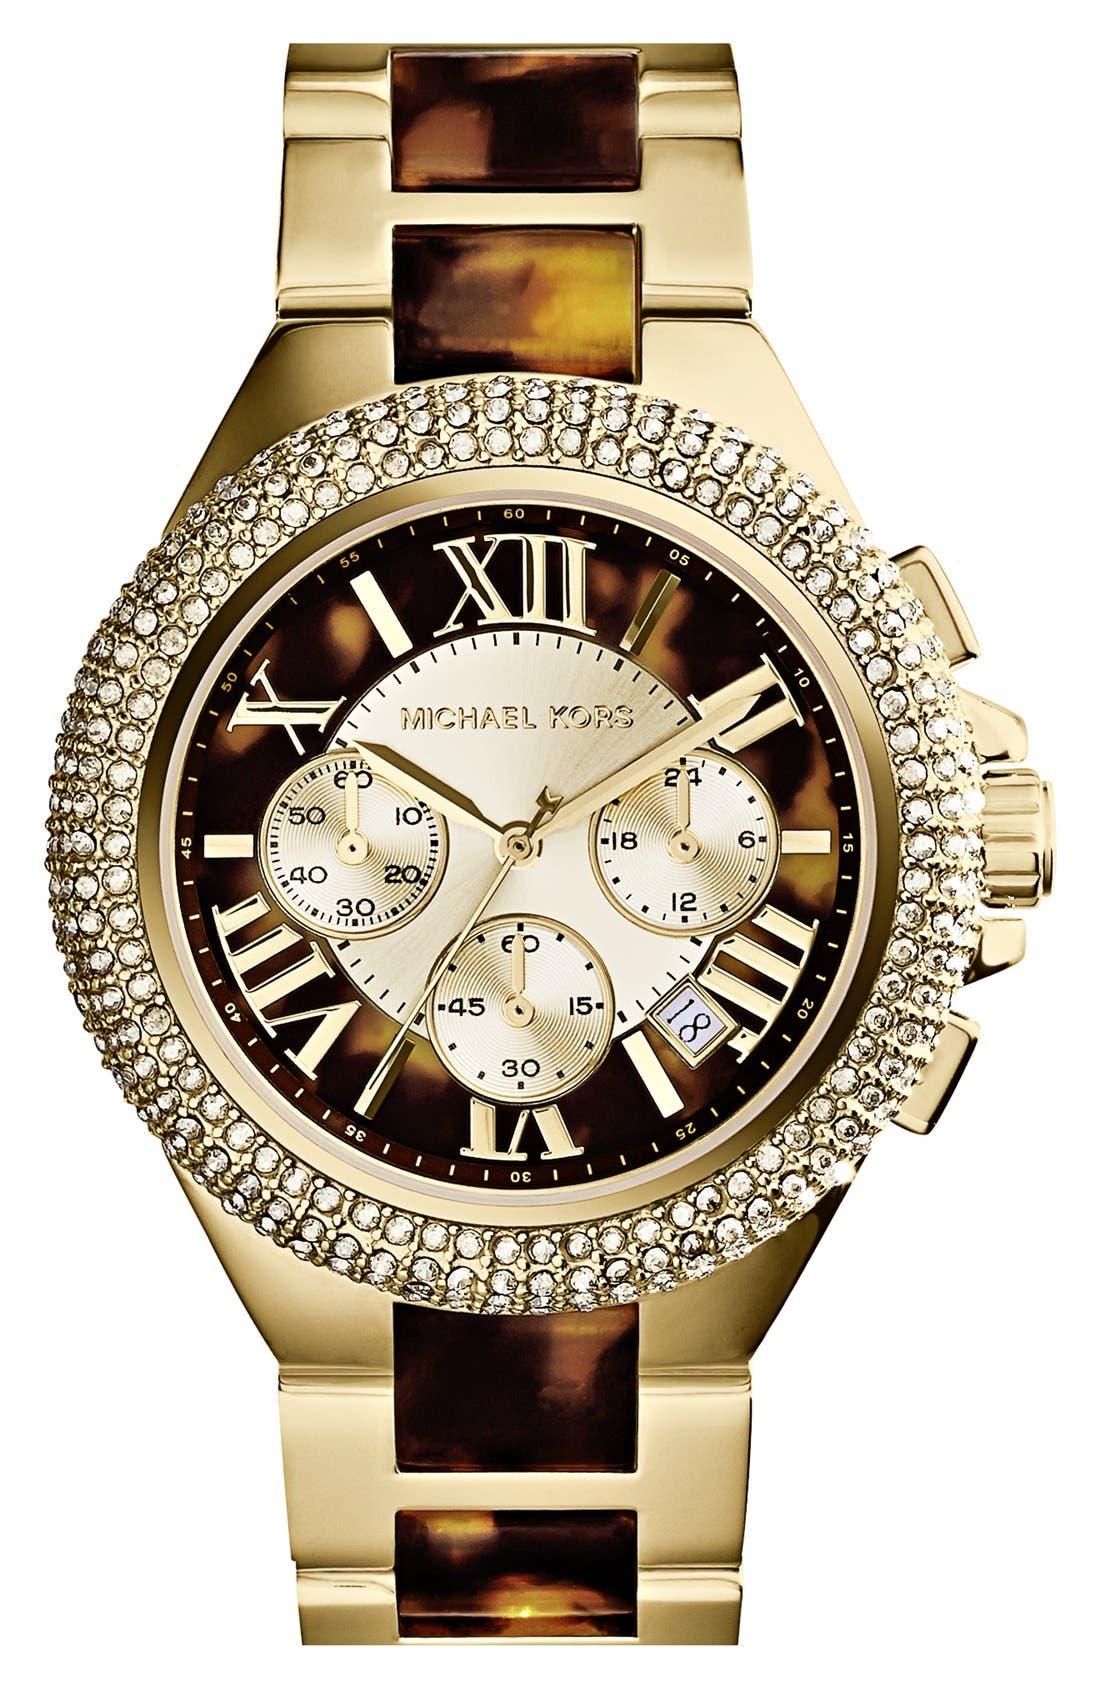 Alternate Image 1 Selected - Michael Kors 'Camille' Crystal Bezel Chronograph Bracelet Watch, 43mm